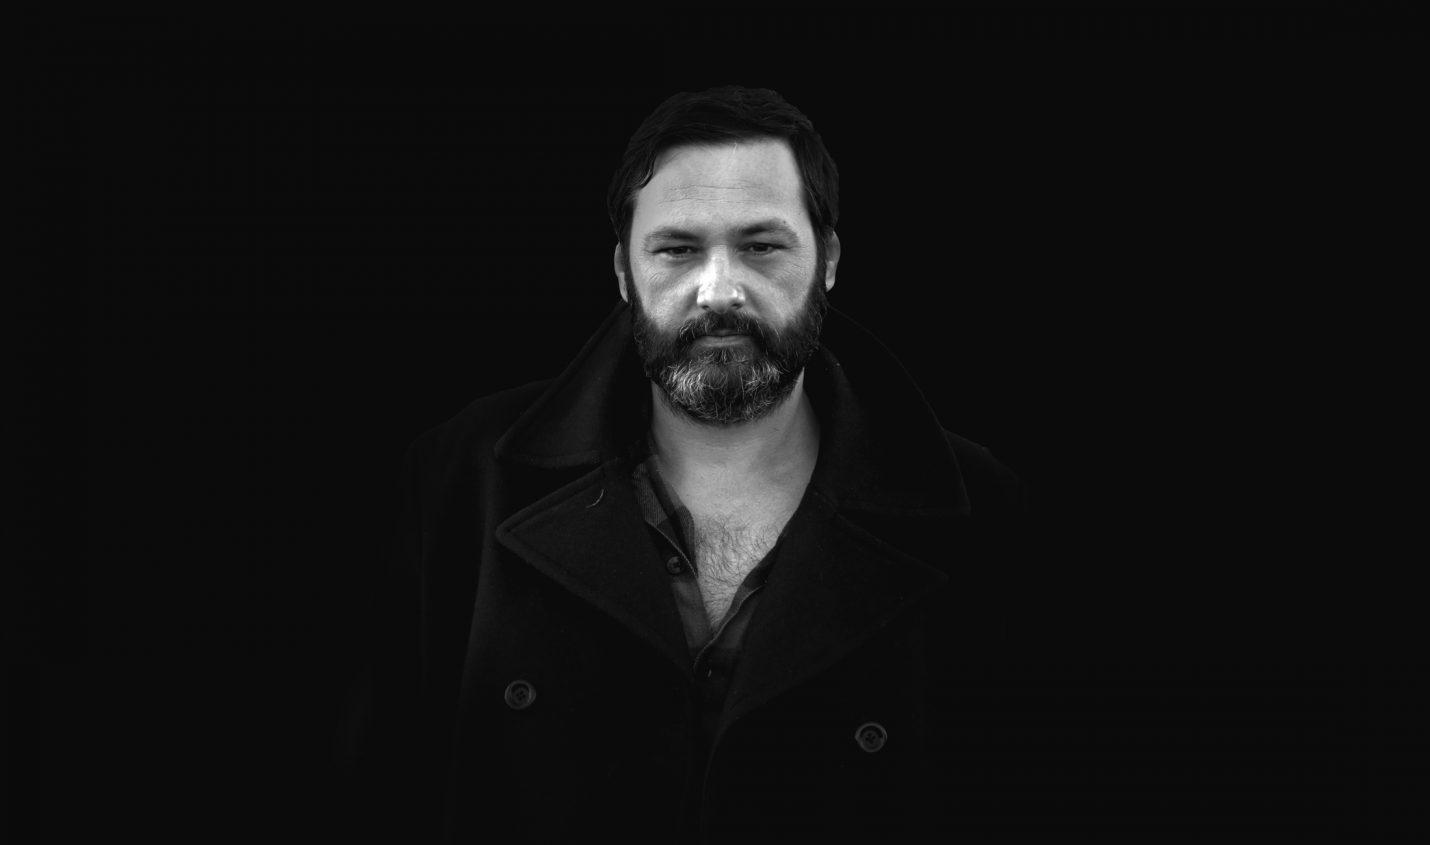 Porträt: Sid Le Rock – Musik wider den grauen Bart